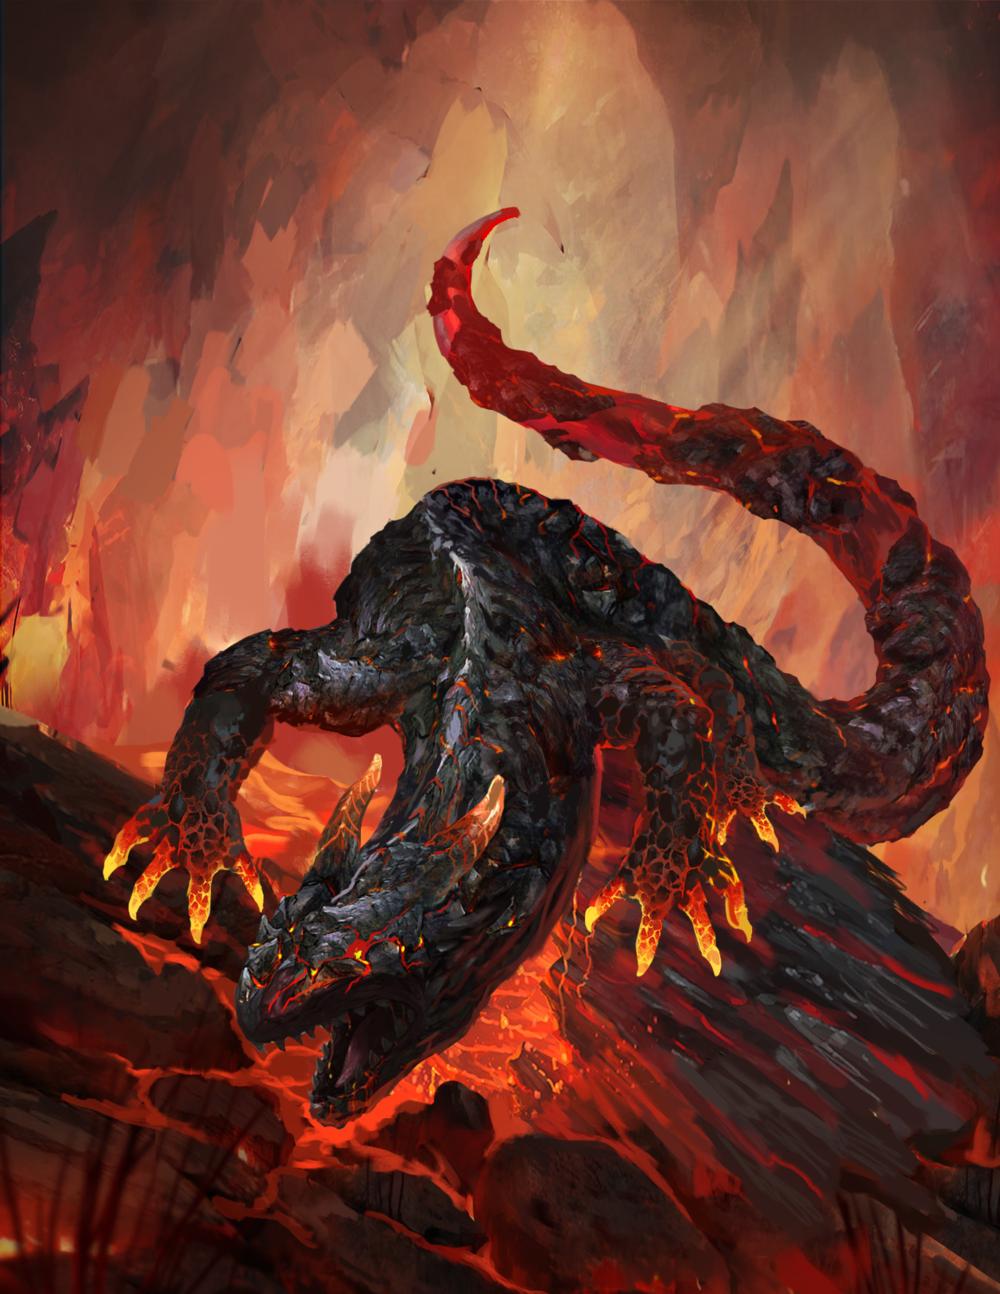 Fire_Elemental__-_Huy_Mai_Van.png